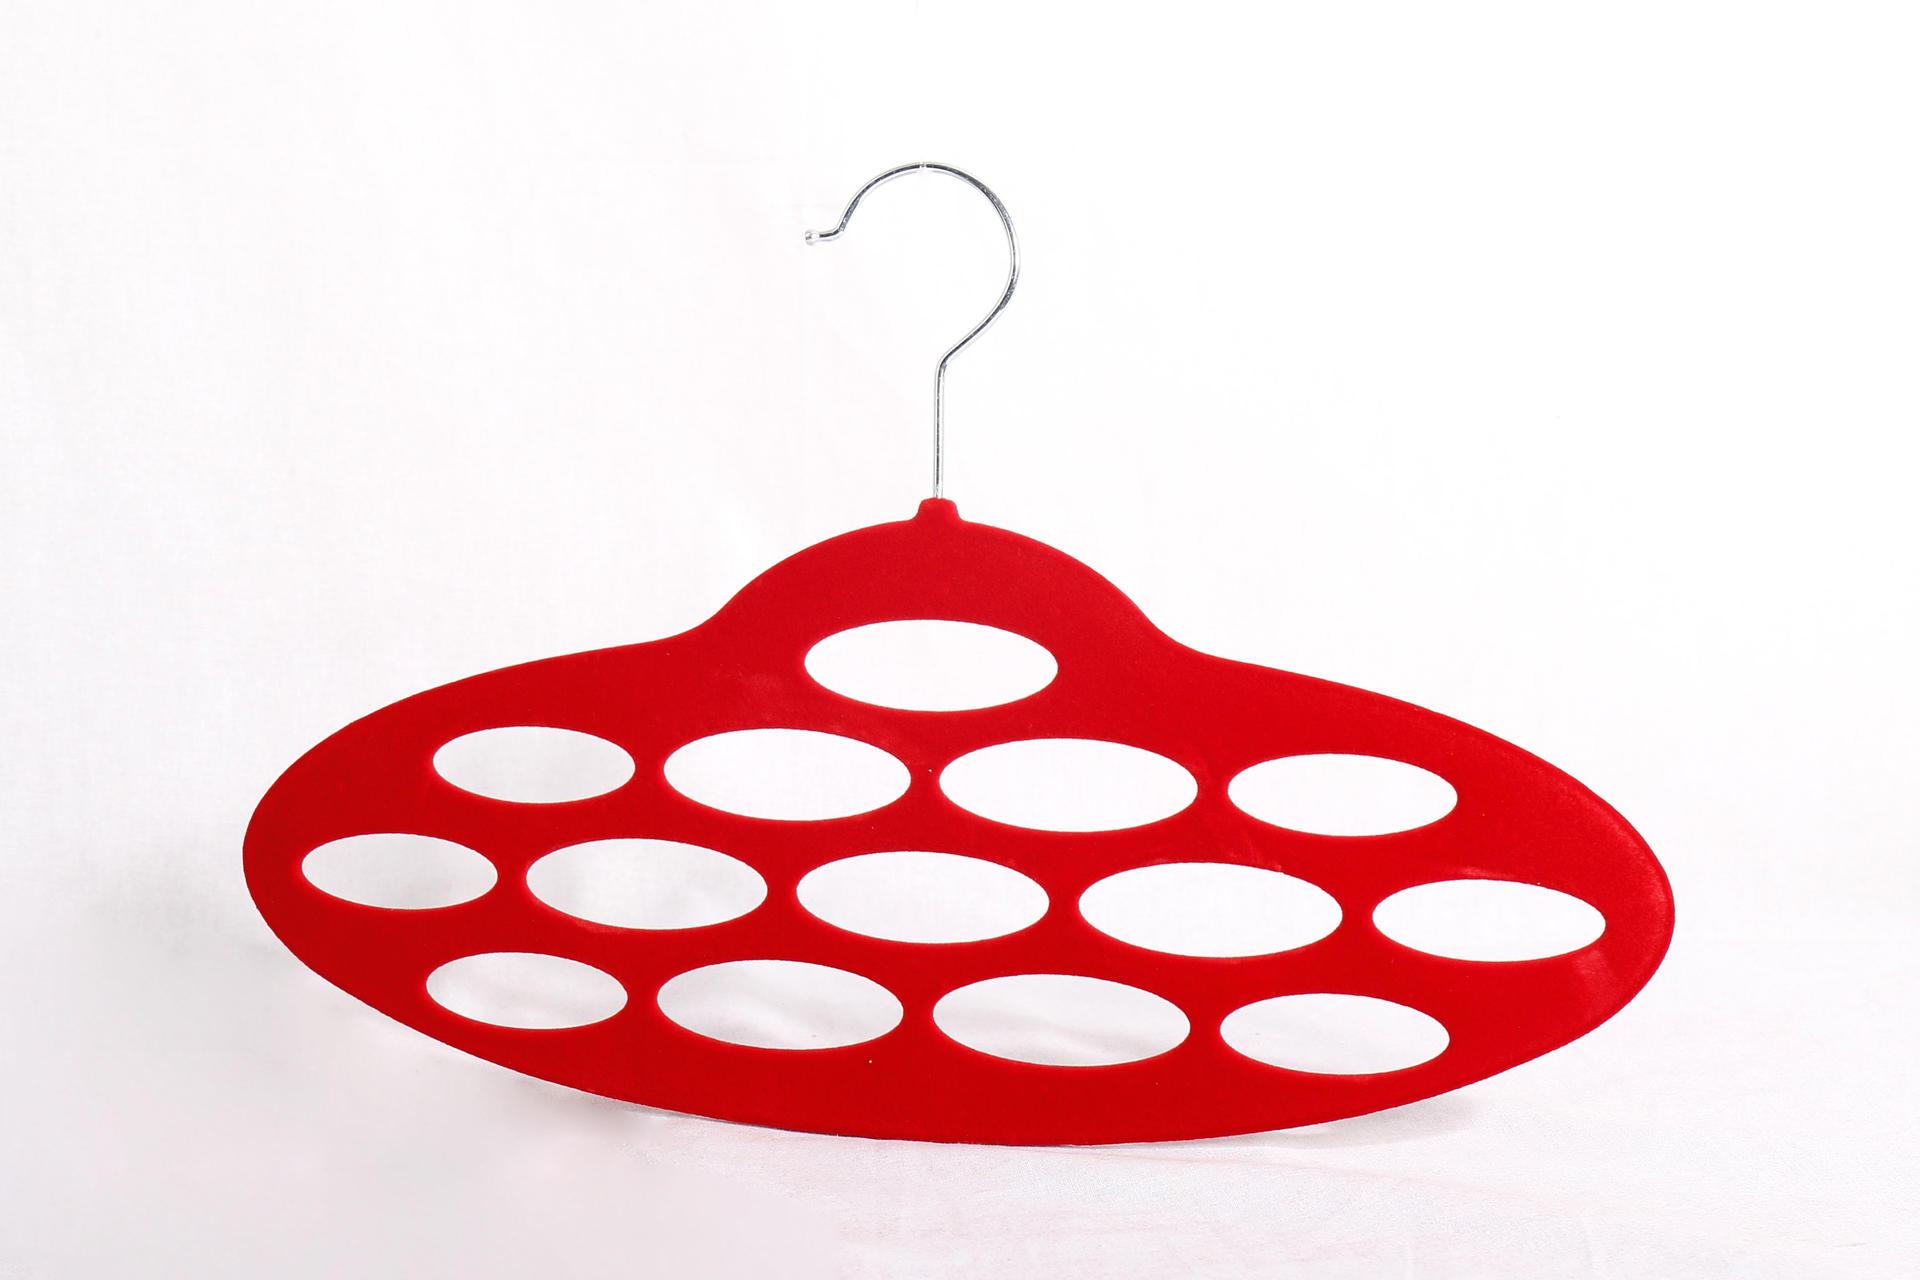 Colorful Velvet Scarves Hanger Hangers for Ties Scarf Simple scarf hanger